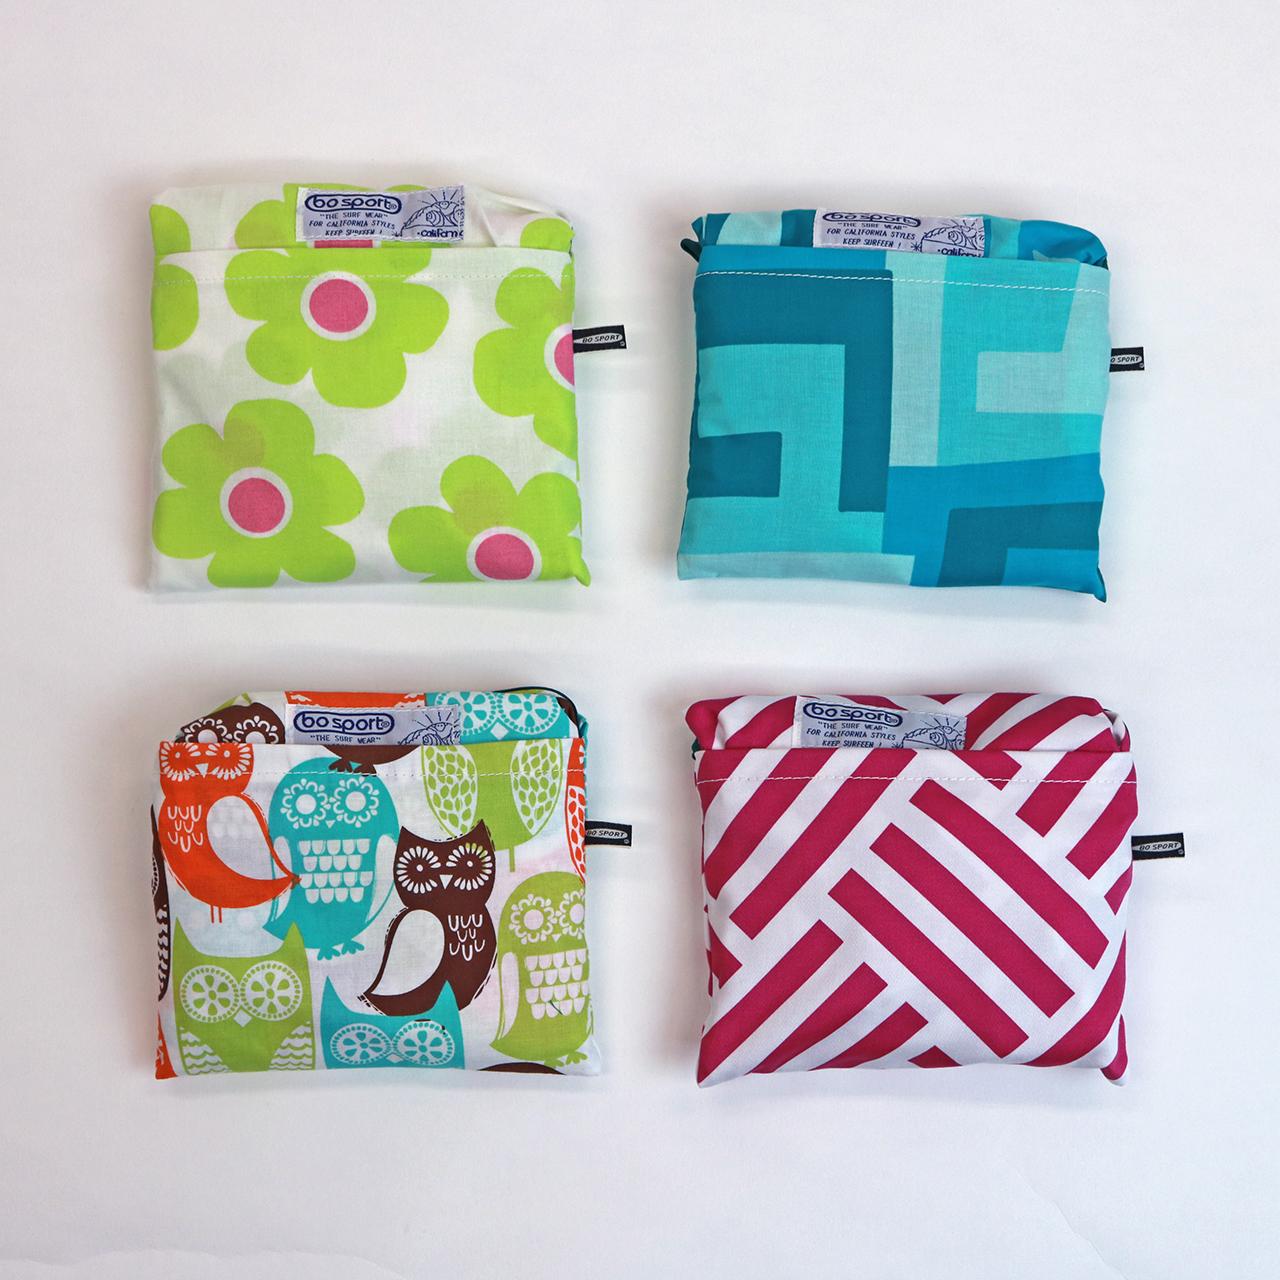 BO SPORT California Fabric Eco Bag